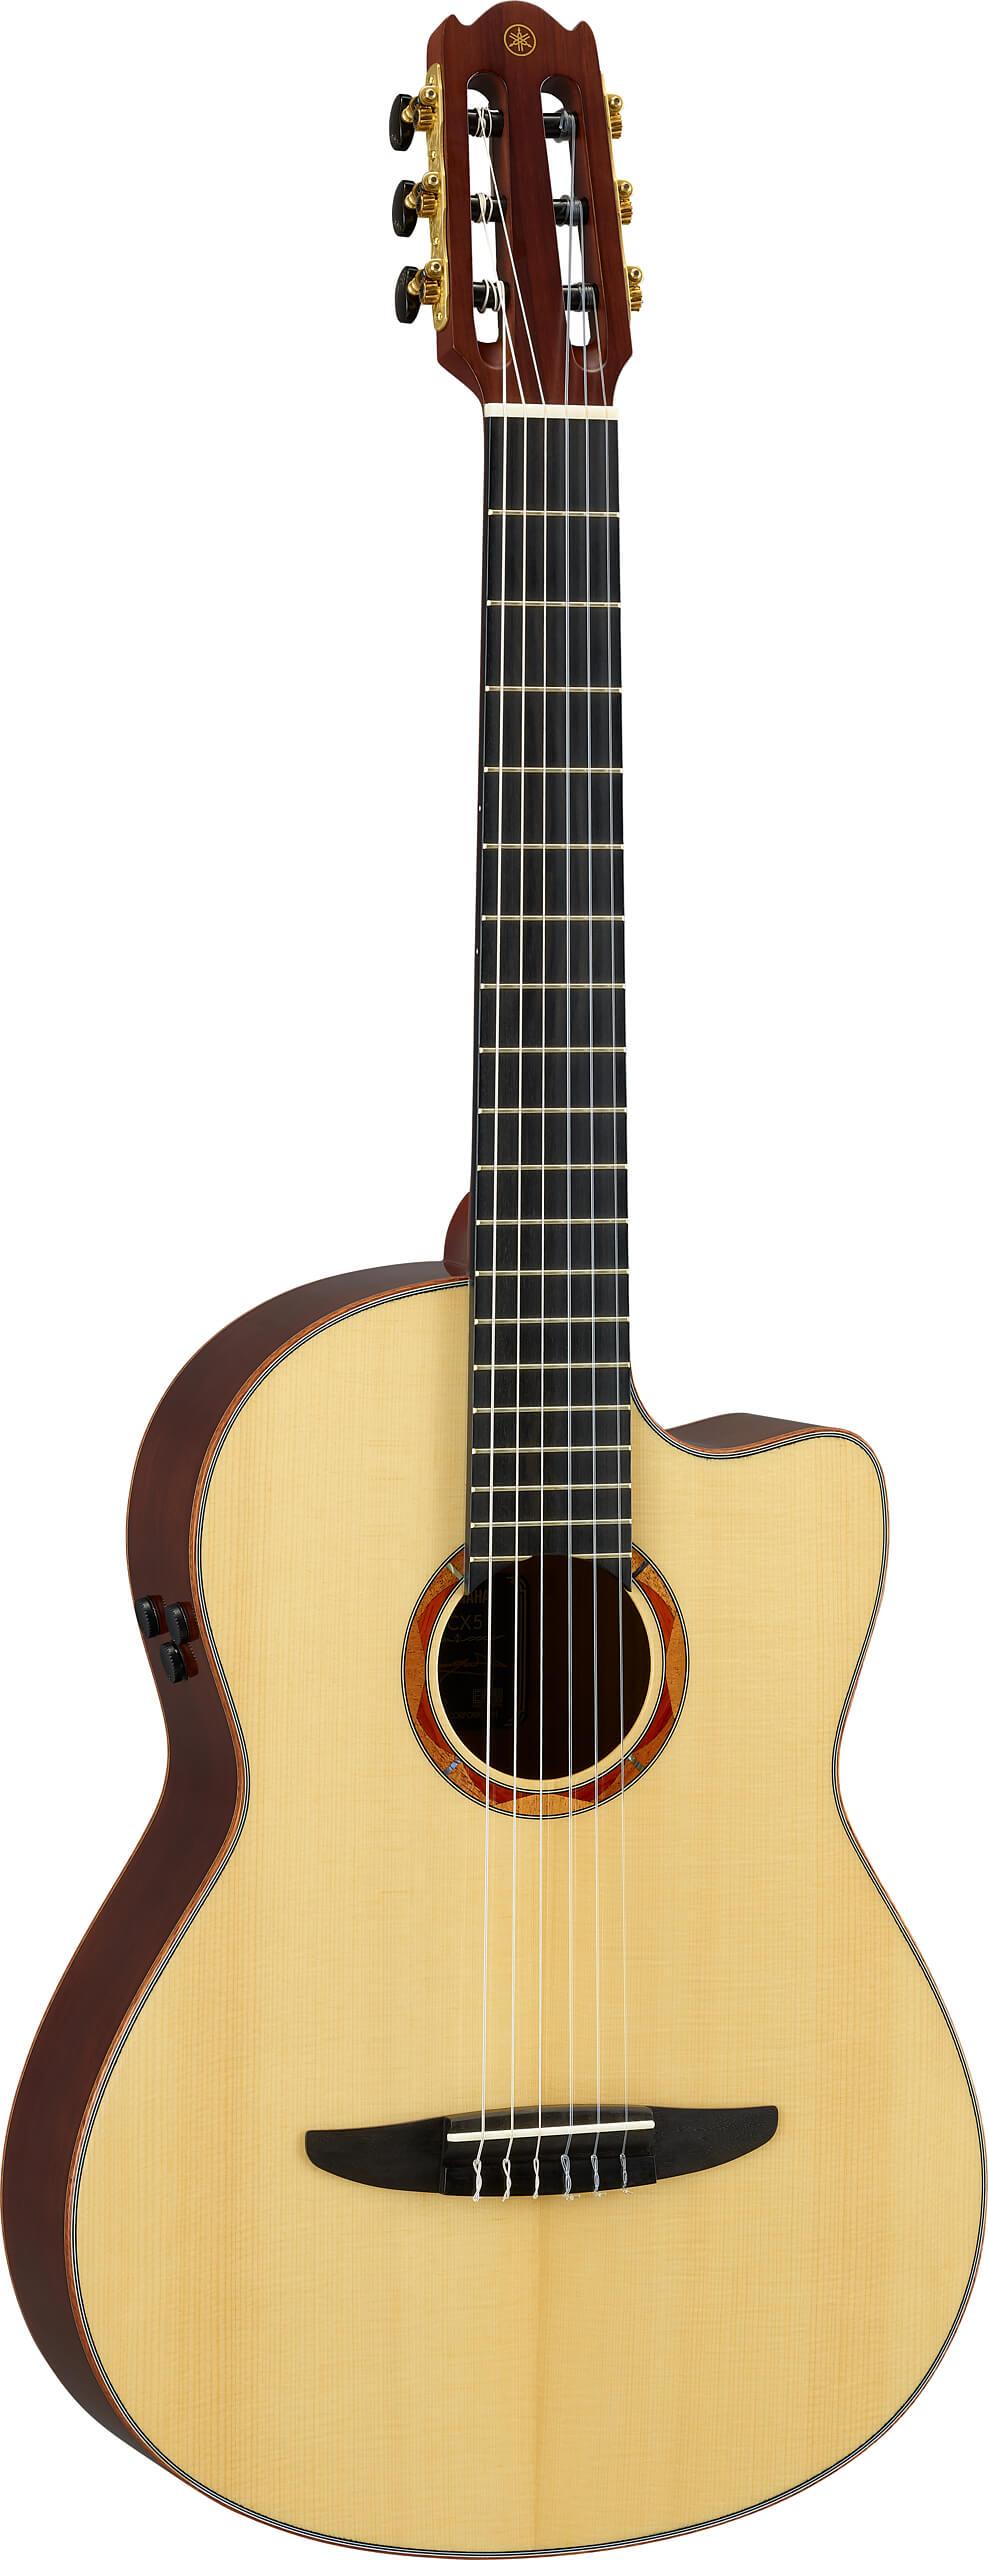 Guitarra Clásica Electrificada Yamaha NCX5